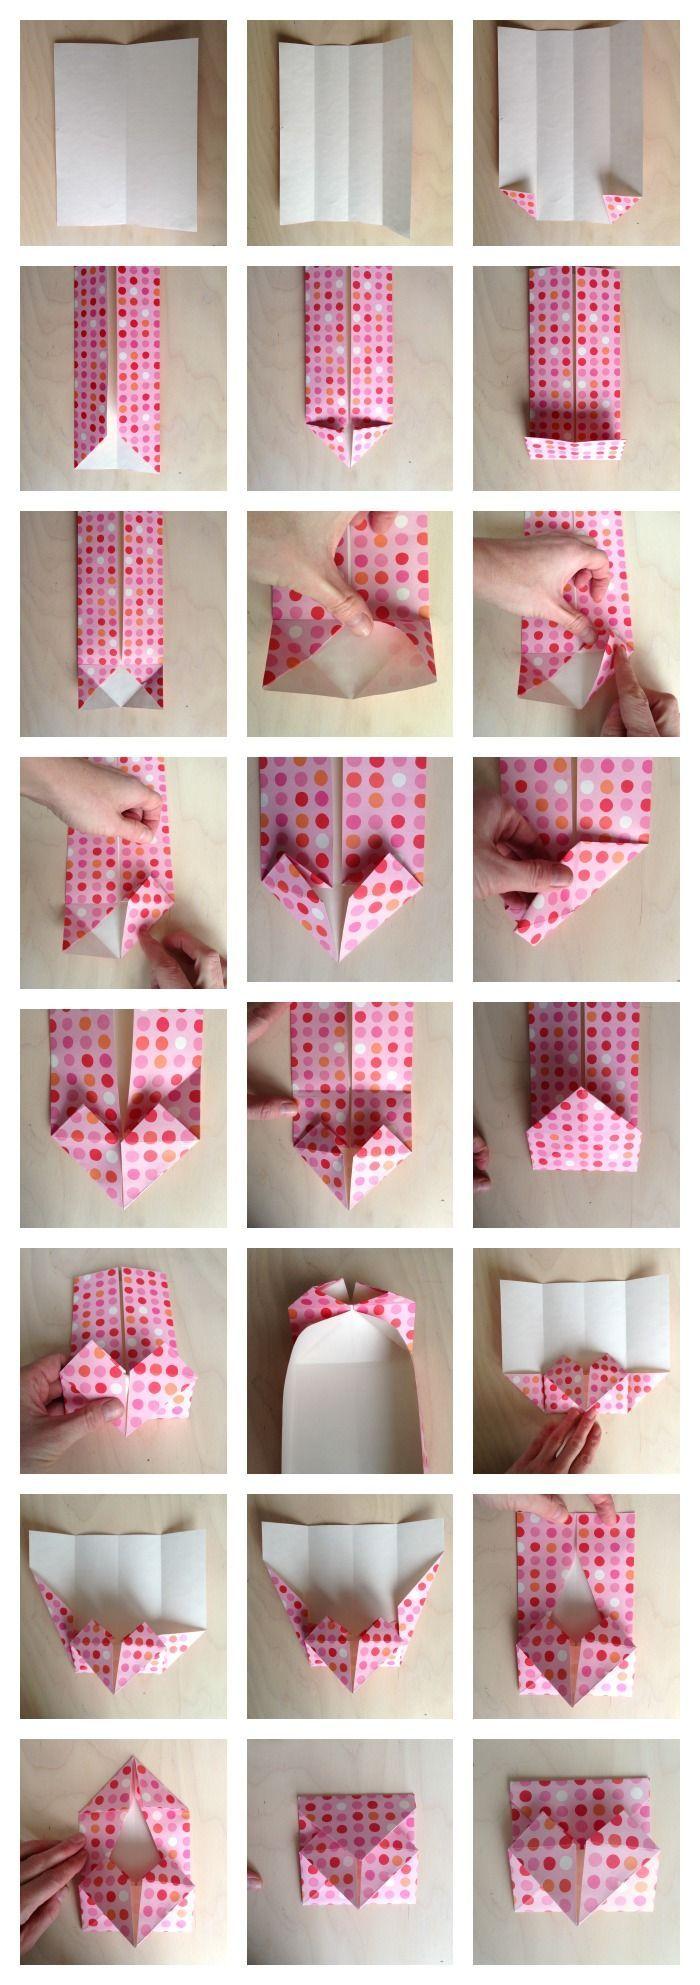 Origami secret heart box images craft decoration ideas diy origami heart box envelope secret message valentines day diy origami heart box envelope secret message jeuxipadfo Choice Image